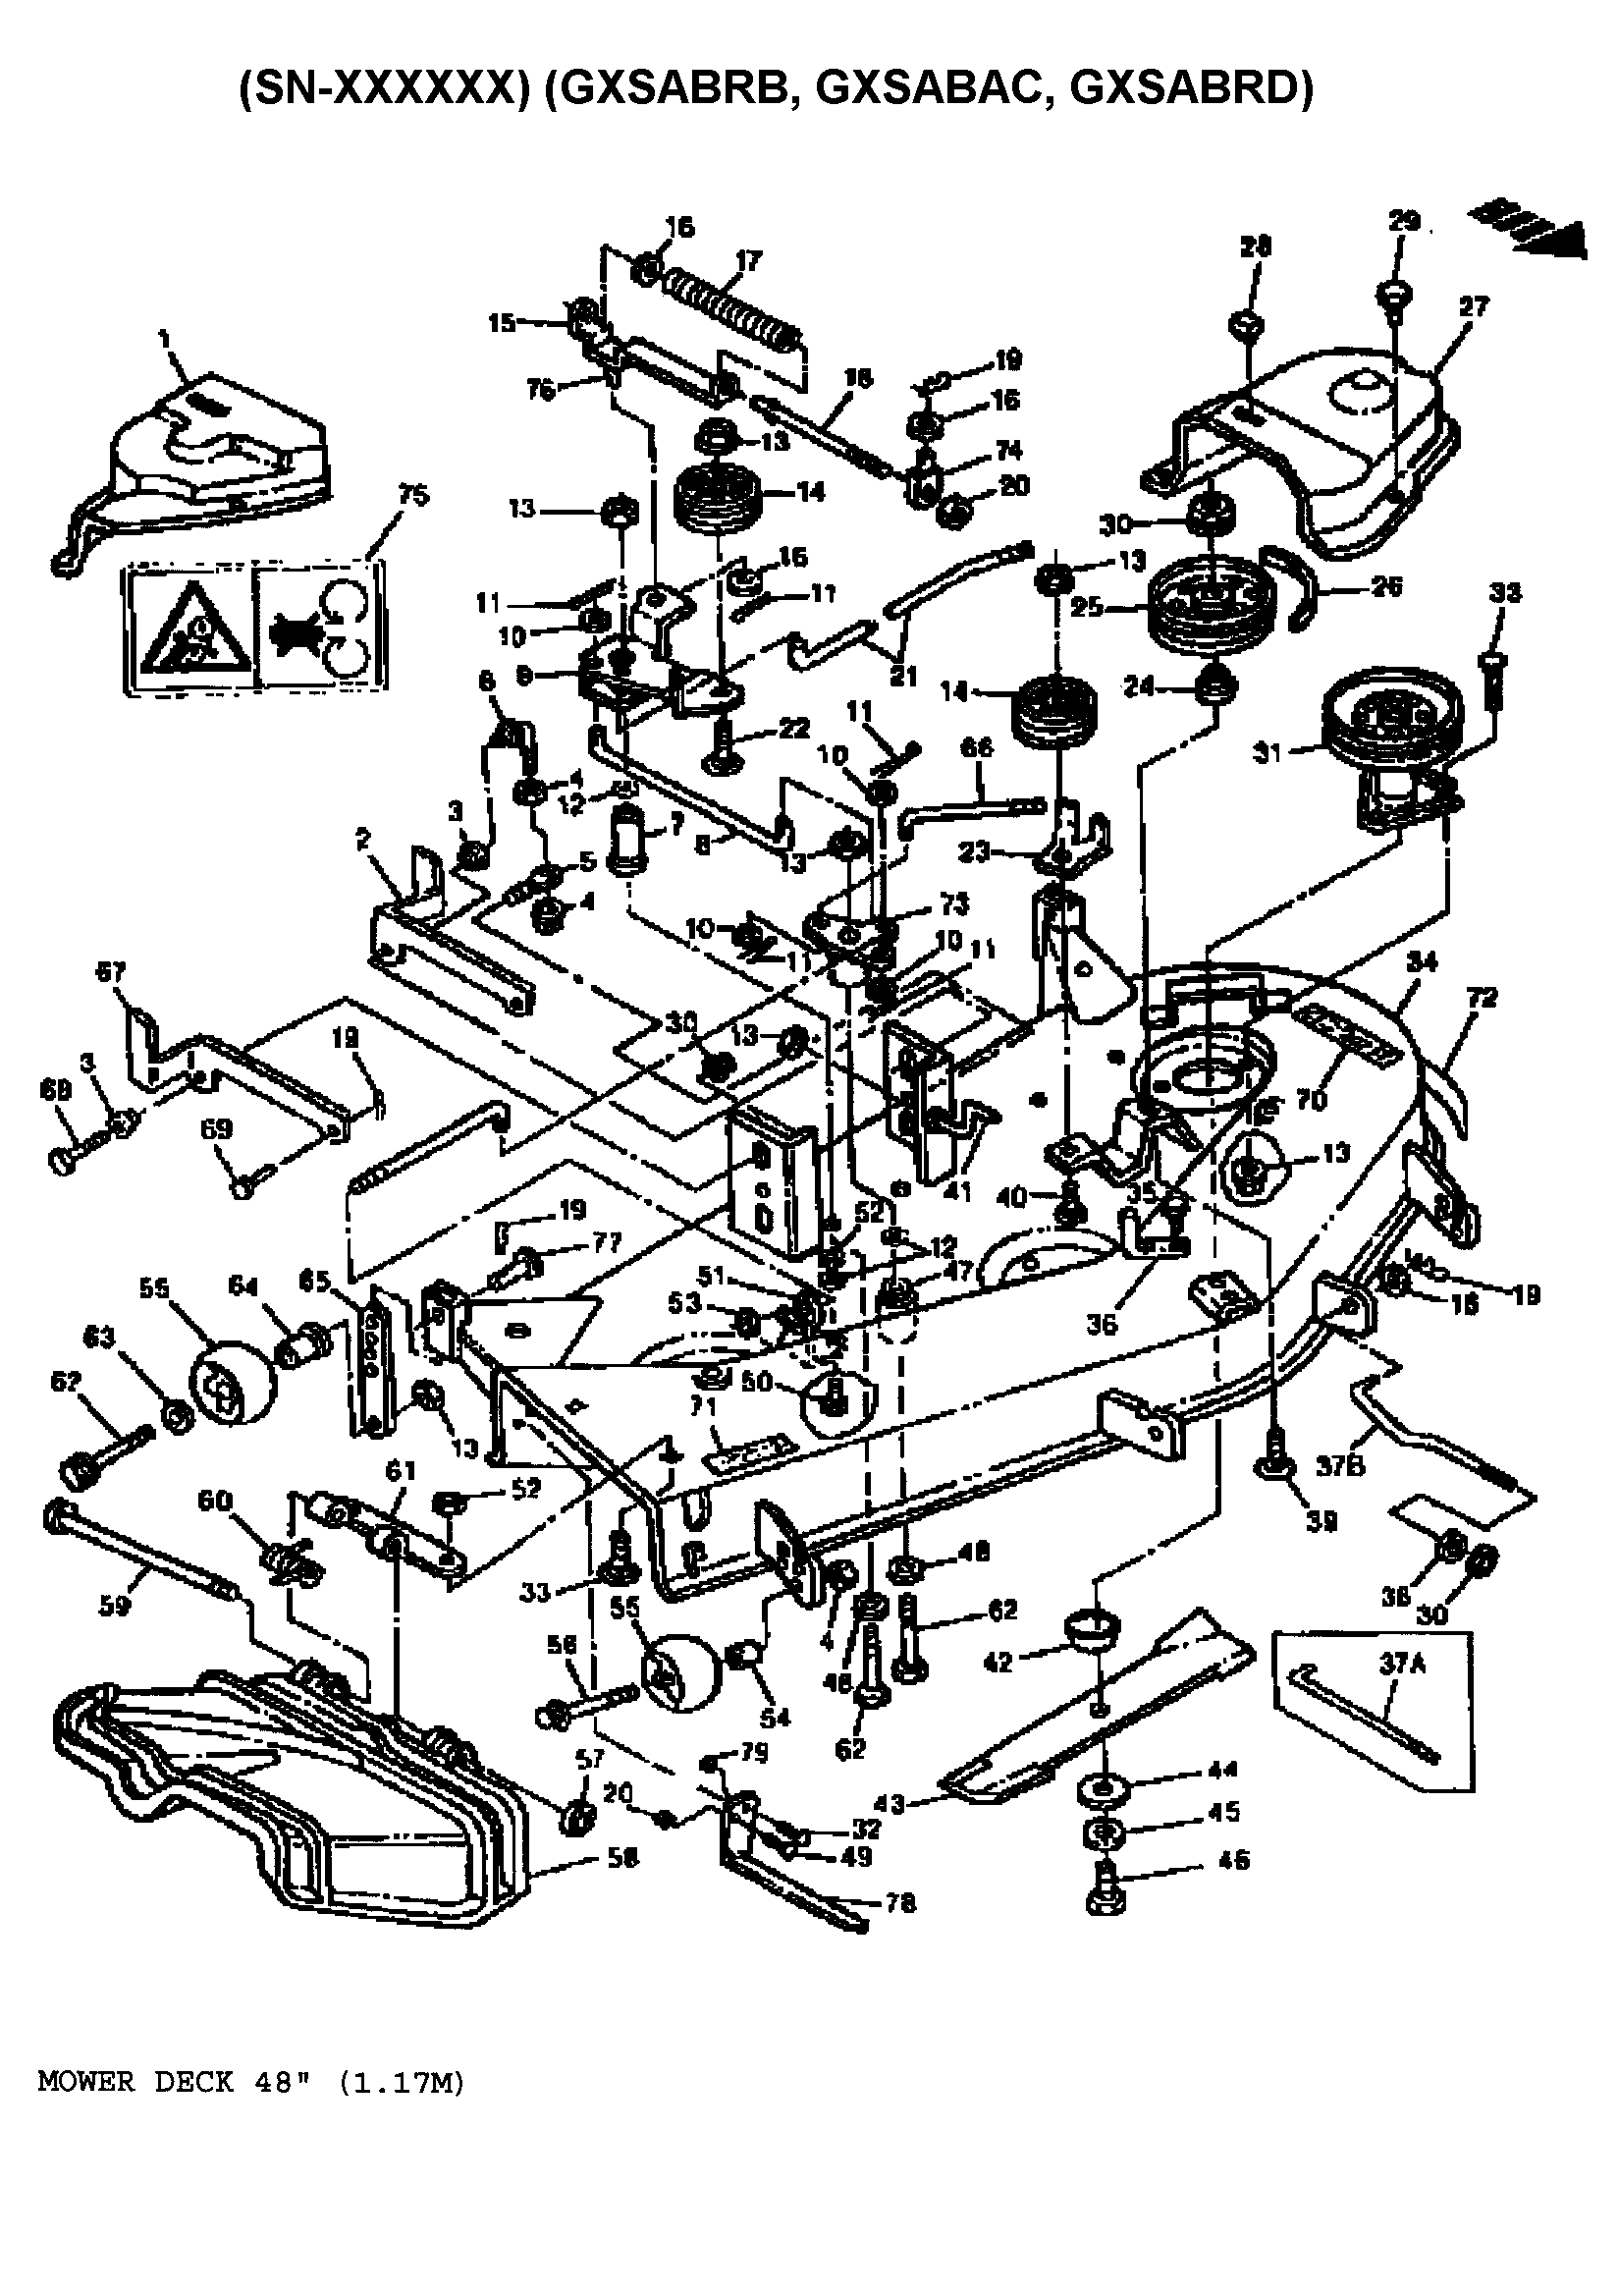 john deere sabre 1438gs wiring diagram gq patrol stereo model 1338 gear gxsabrf lawn tractor genuine parts